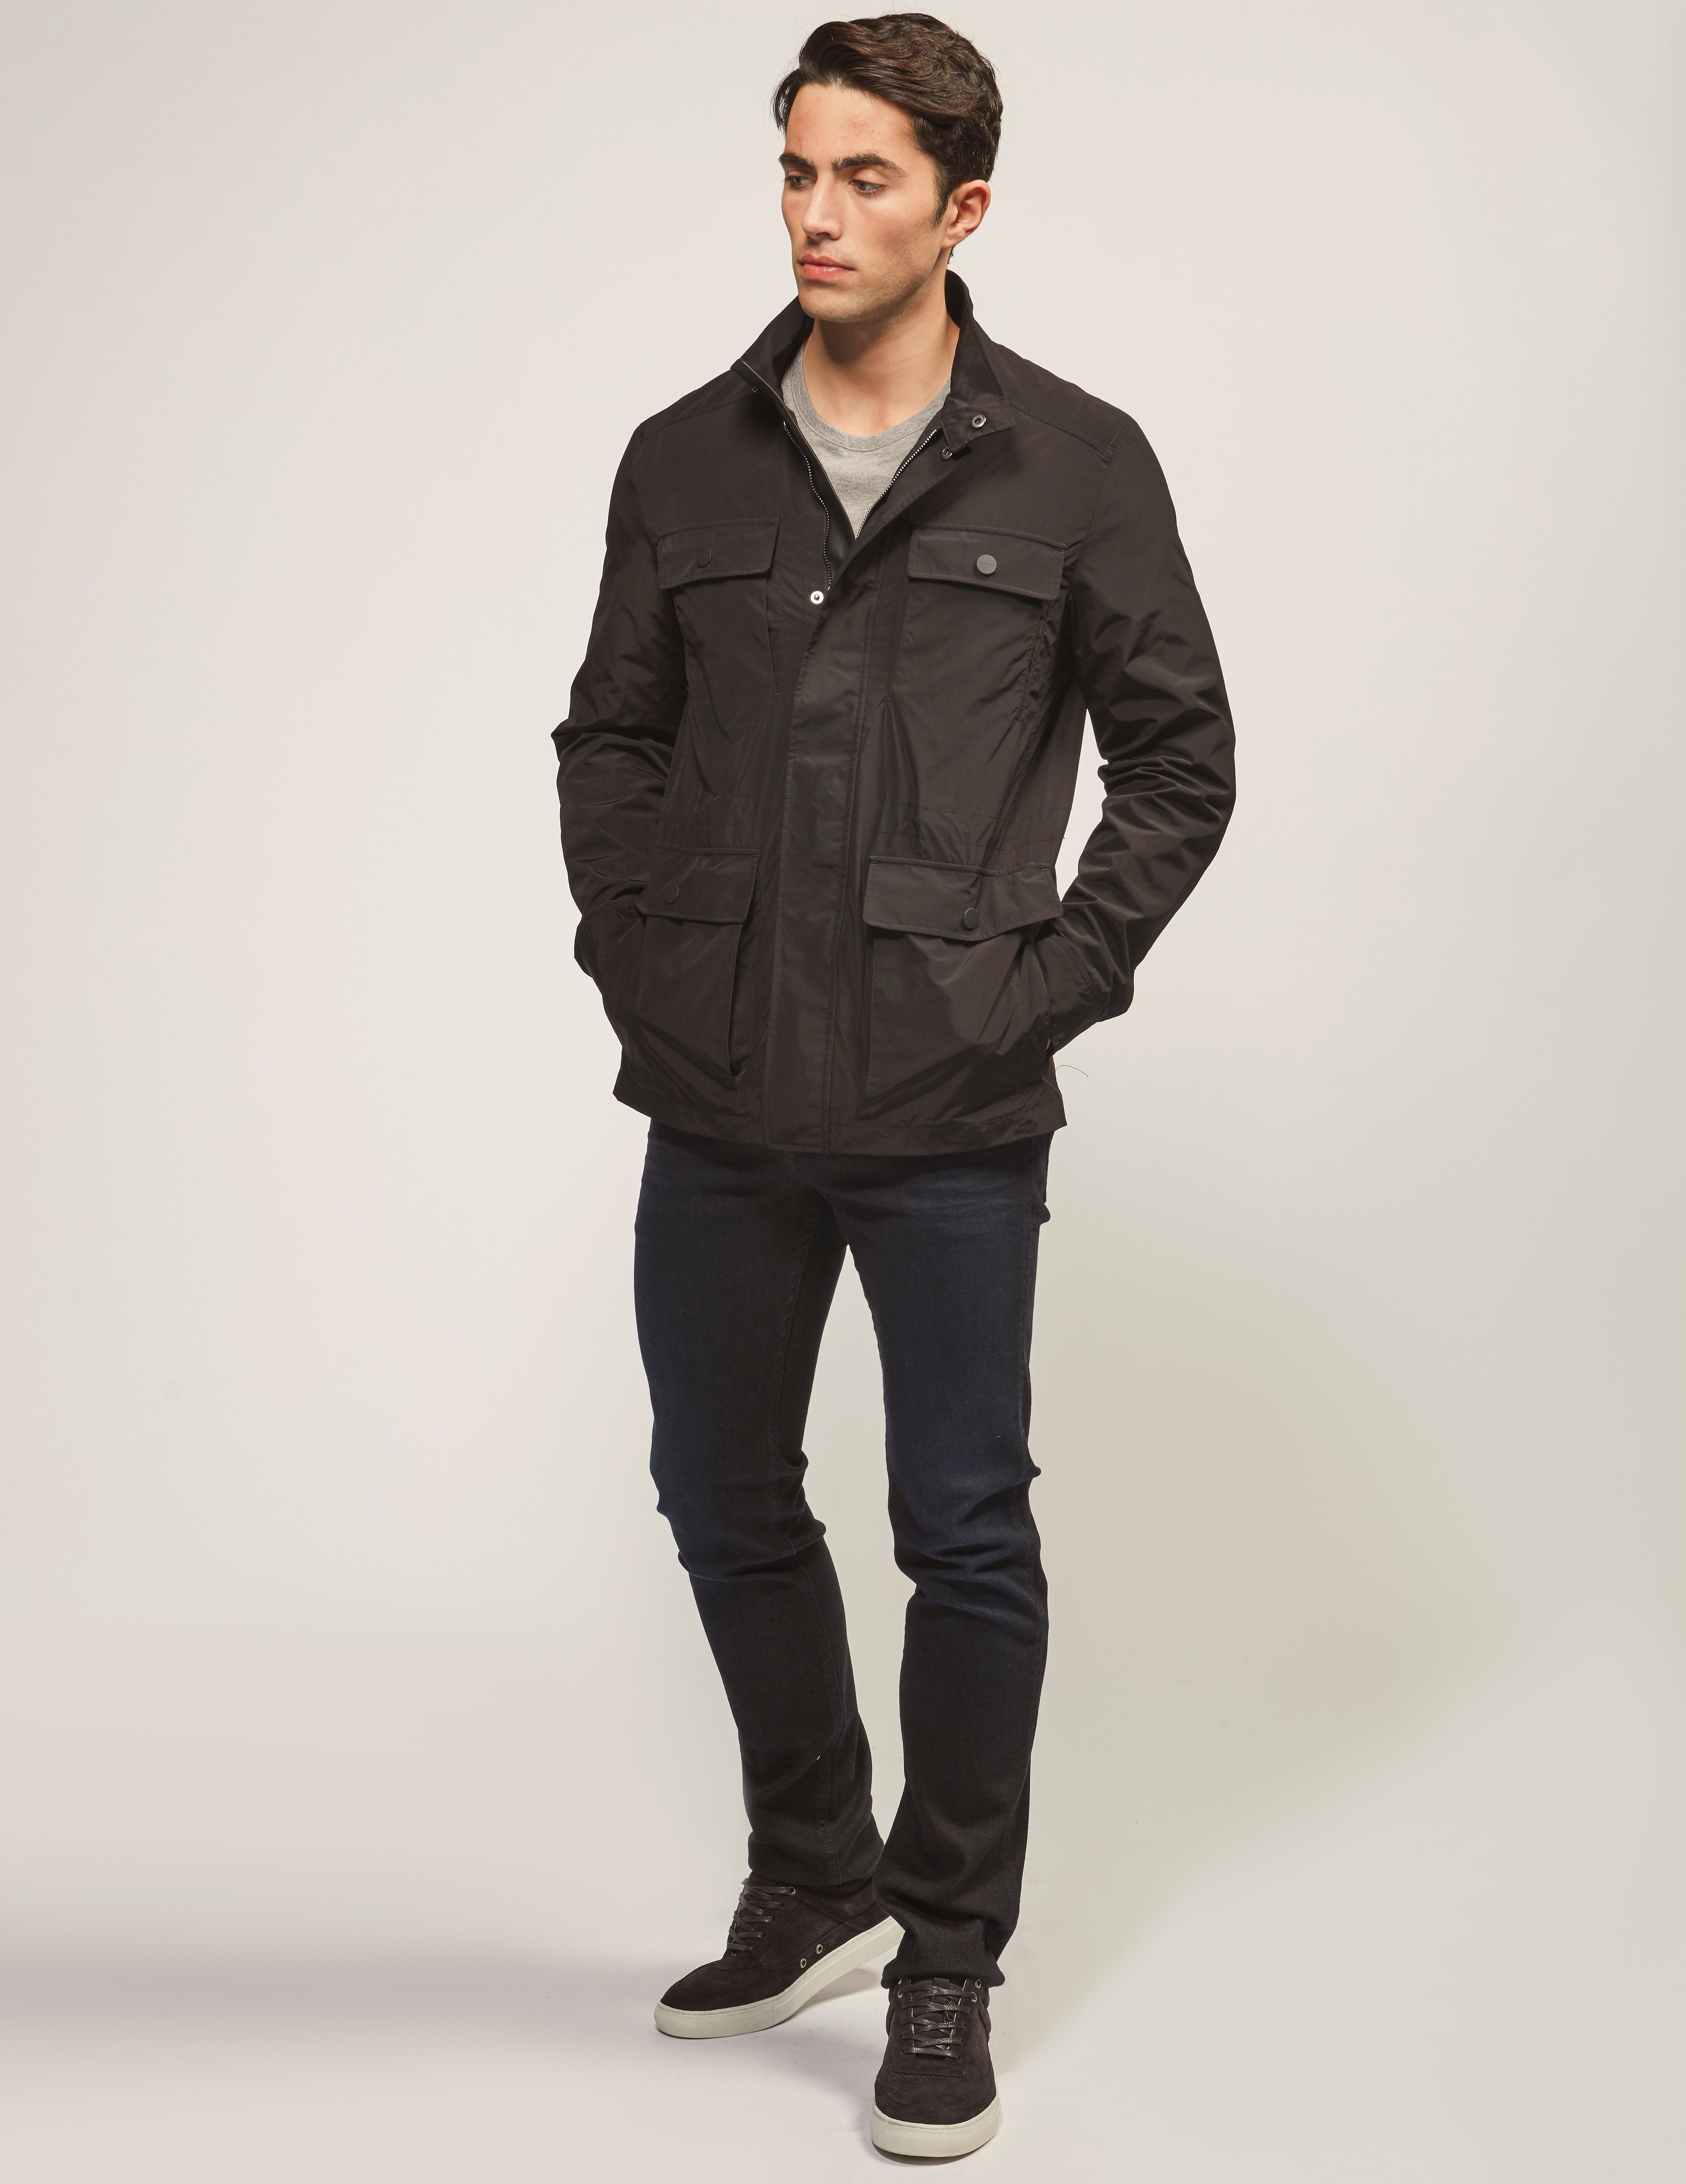 Michael Kors Four Pocket Field Jacket